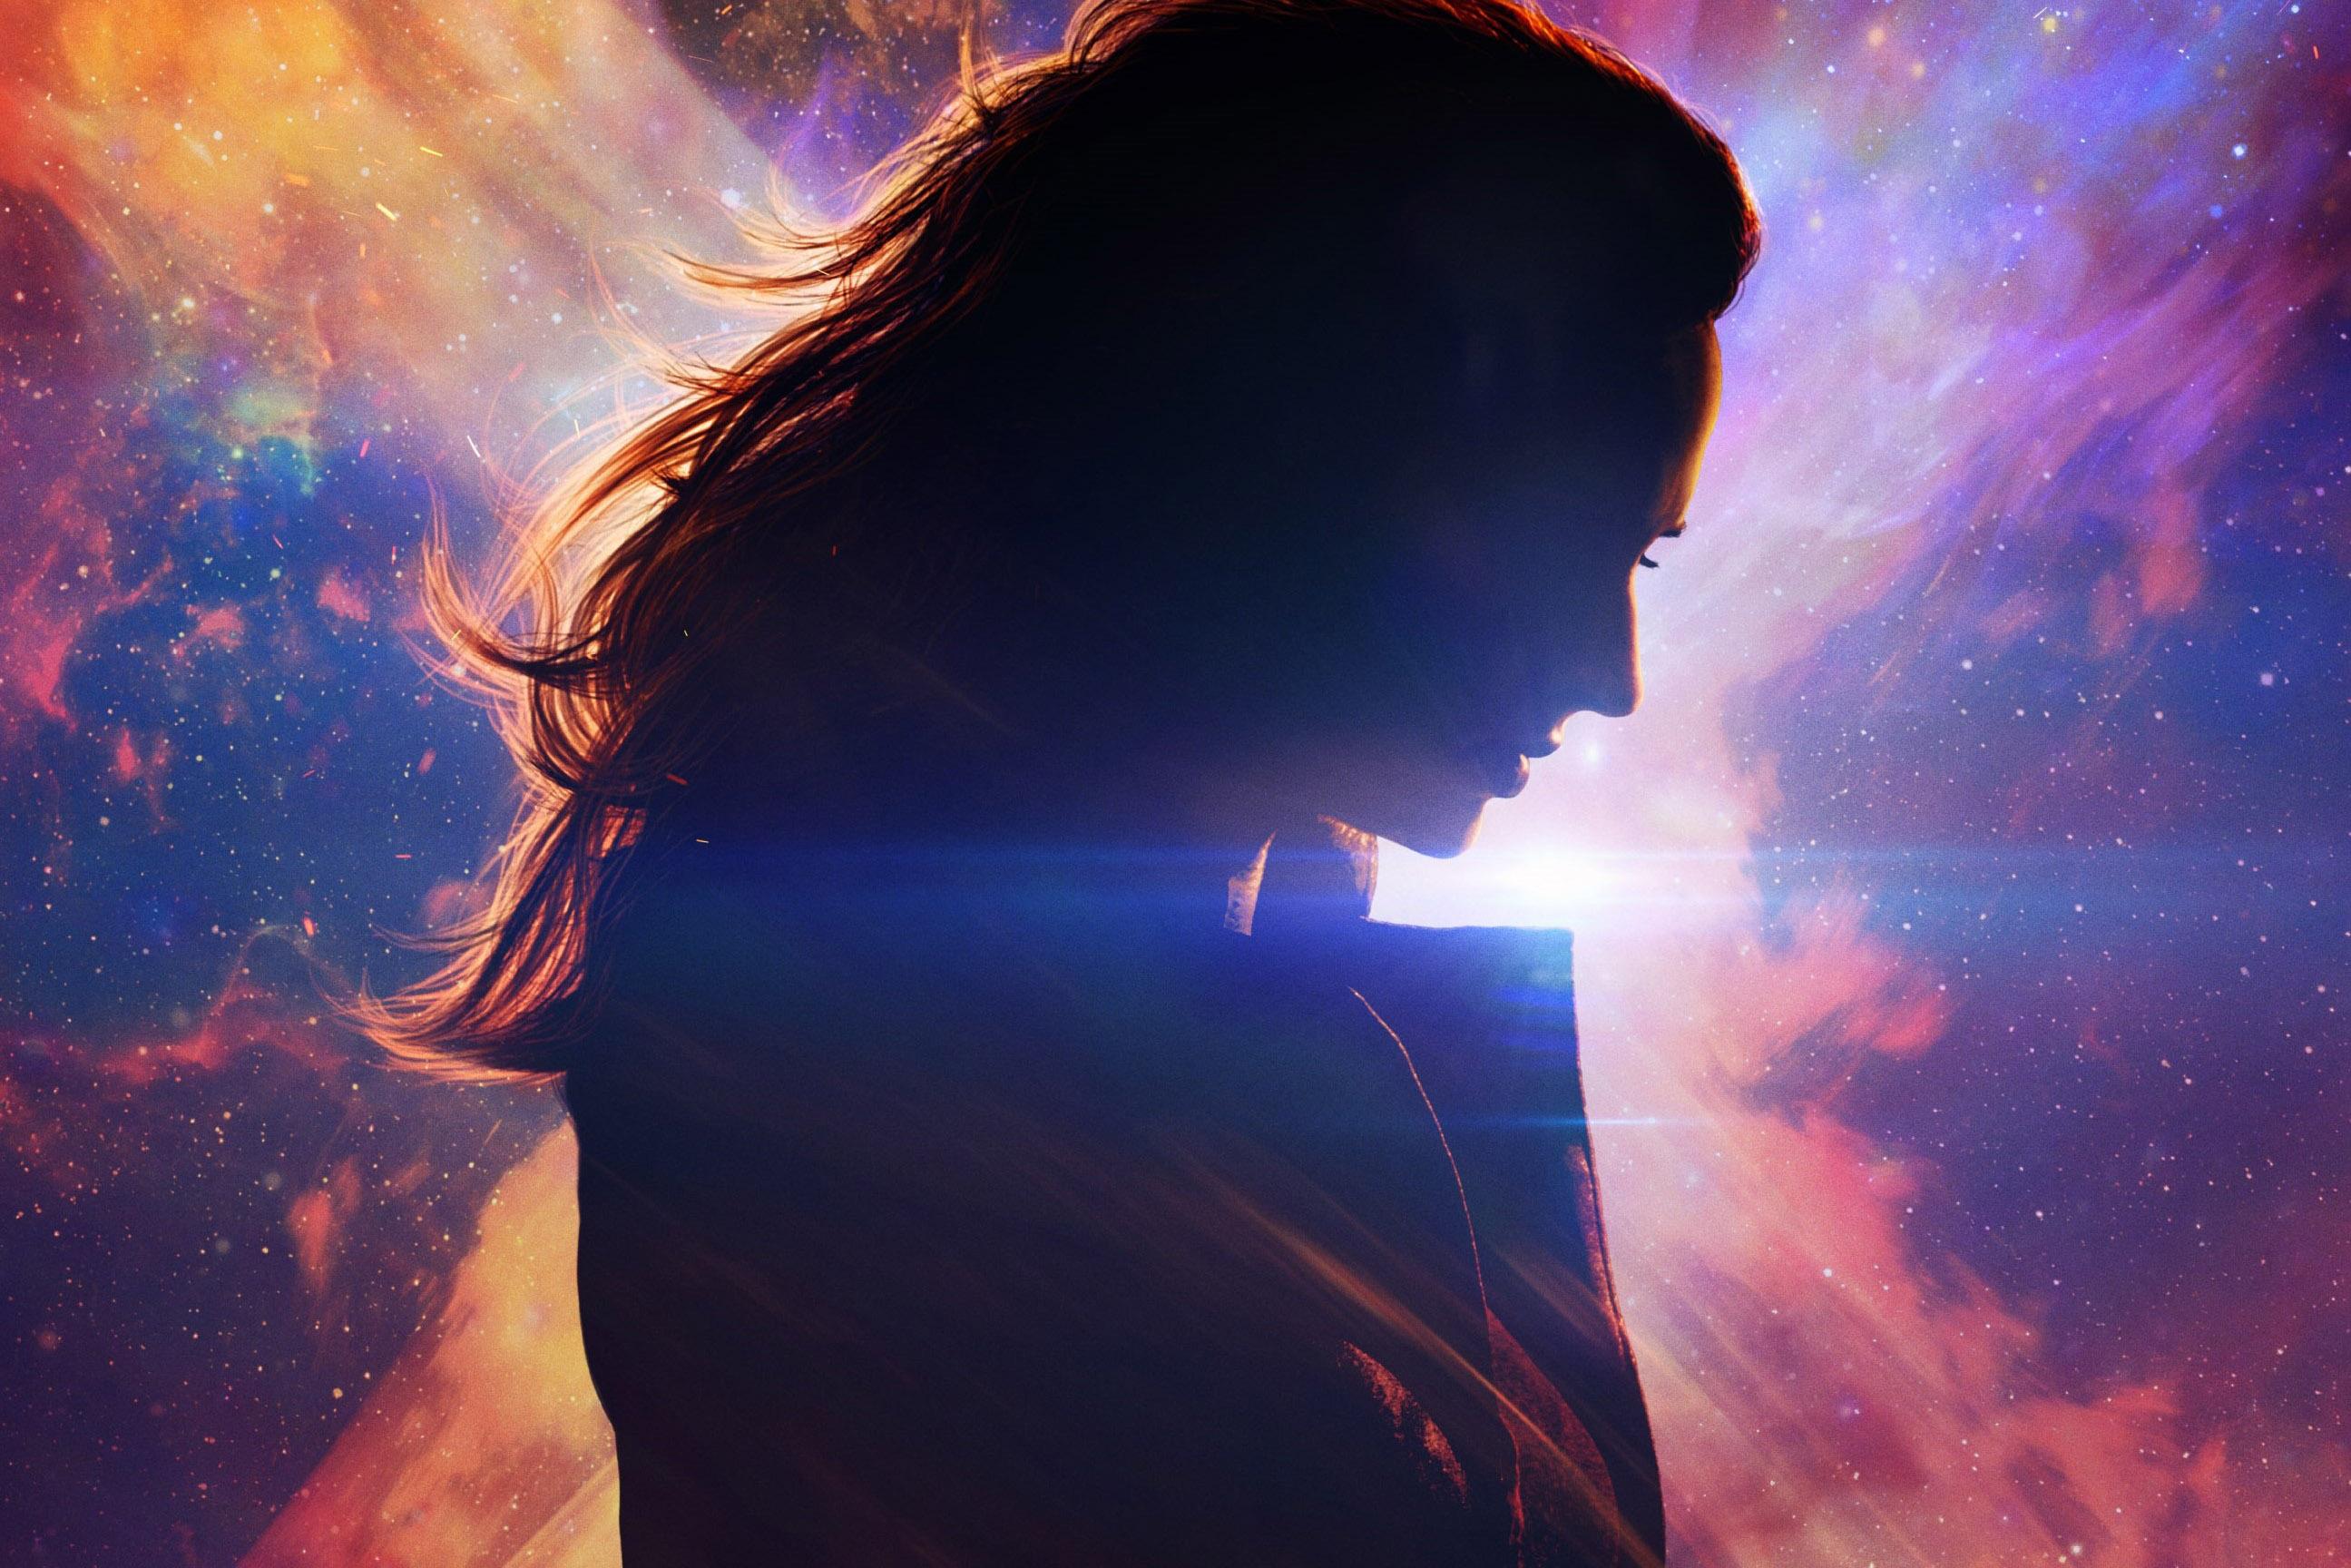 『X-MEN:ダークフェニックス』の日本公開日が2019年6月に決定!日本版予告も公開!